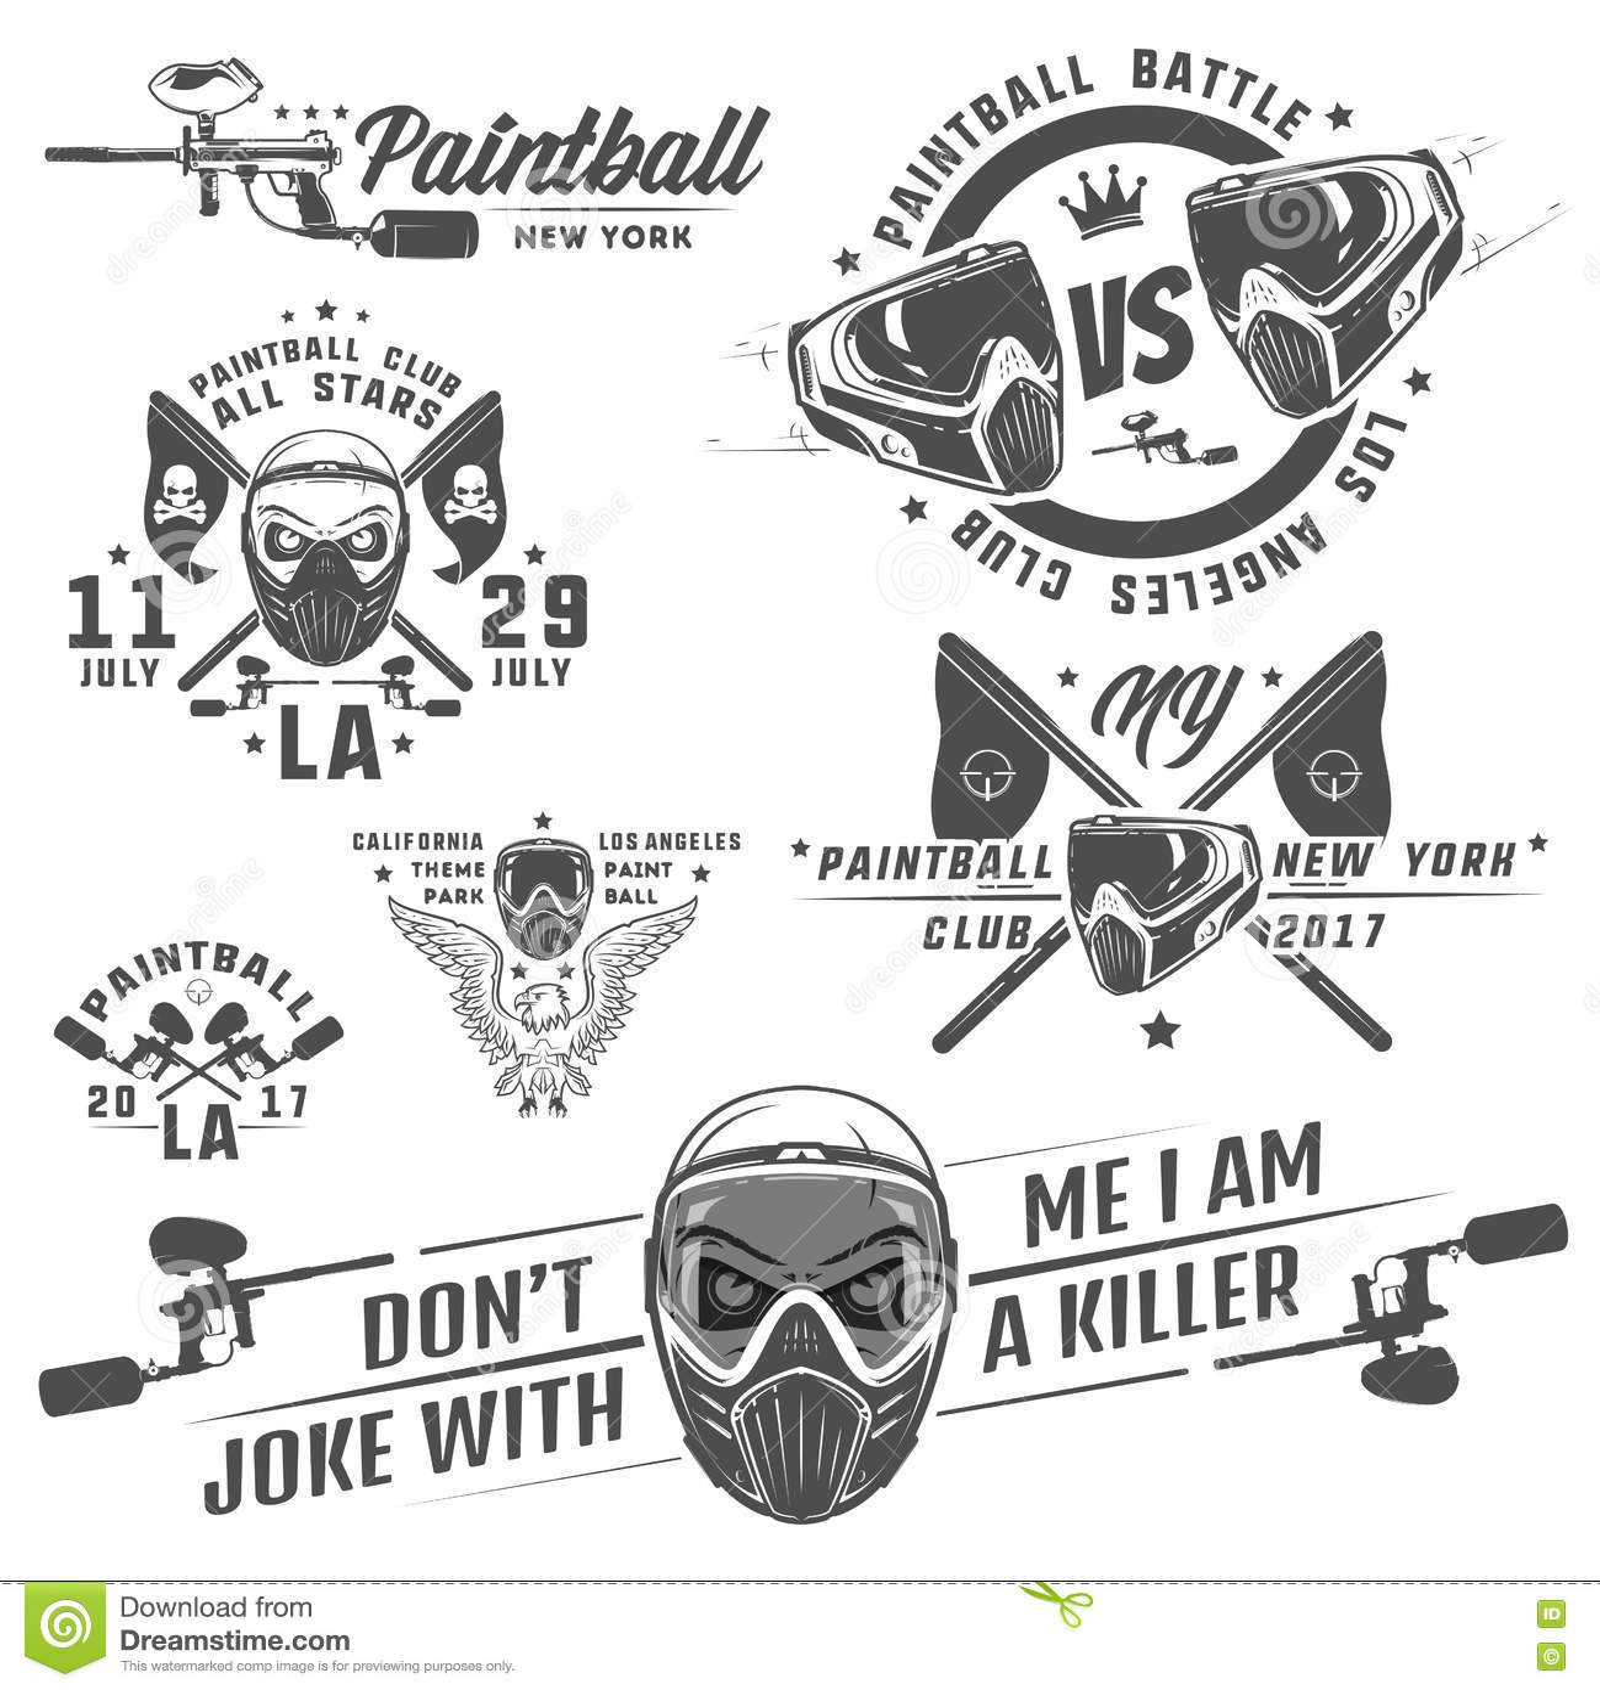 Sistema de Paintball, diseño de Paintball, tatuaje de Paintball